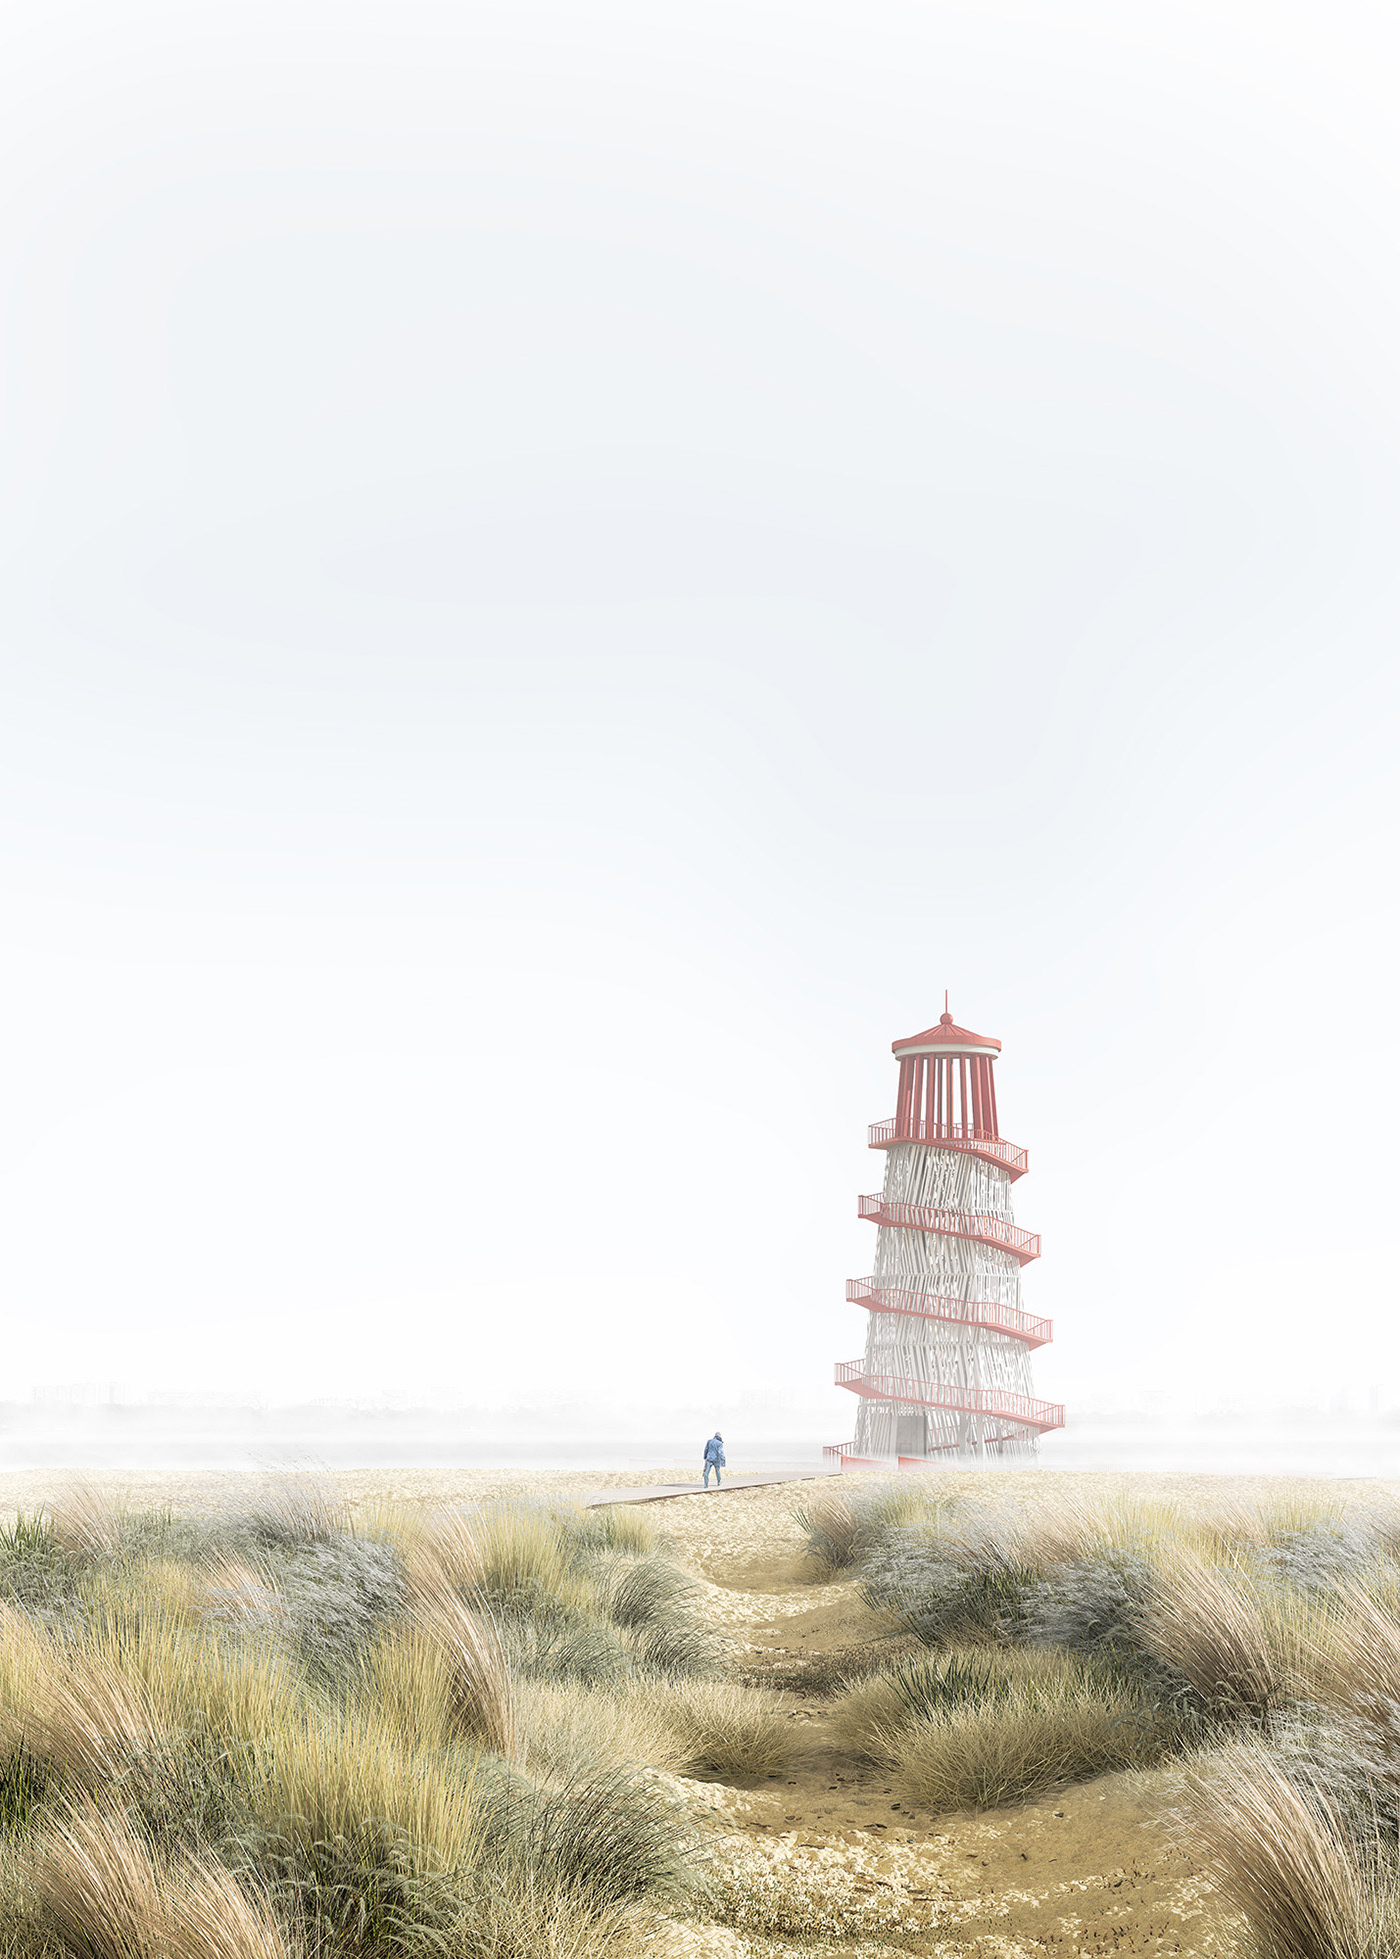 bureauinsight Embankment KnightFrank lighthouse mla+ OTS petrovbereg urban planning voronezh